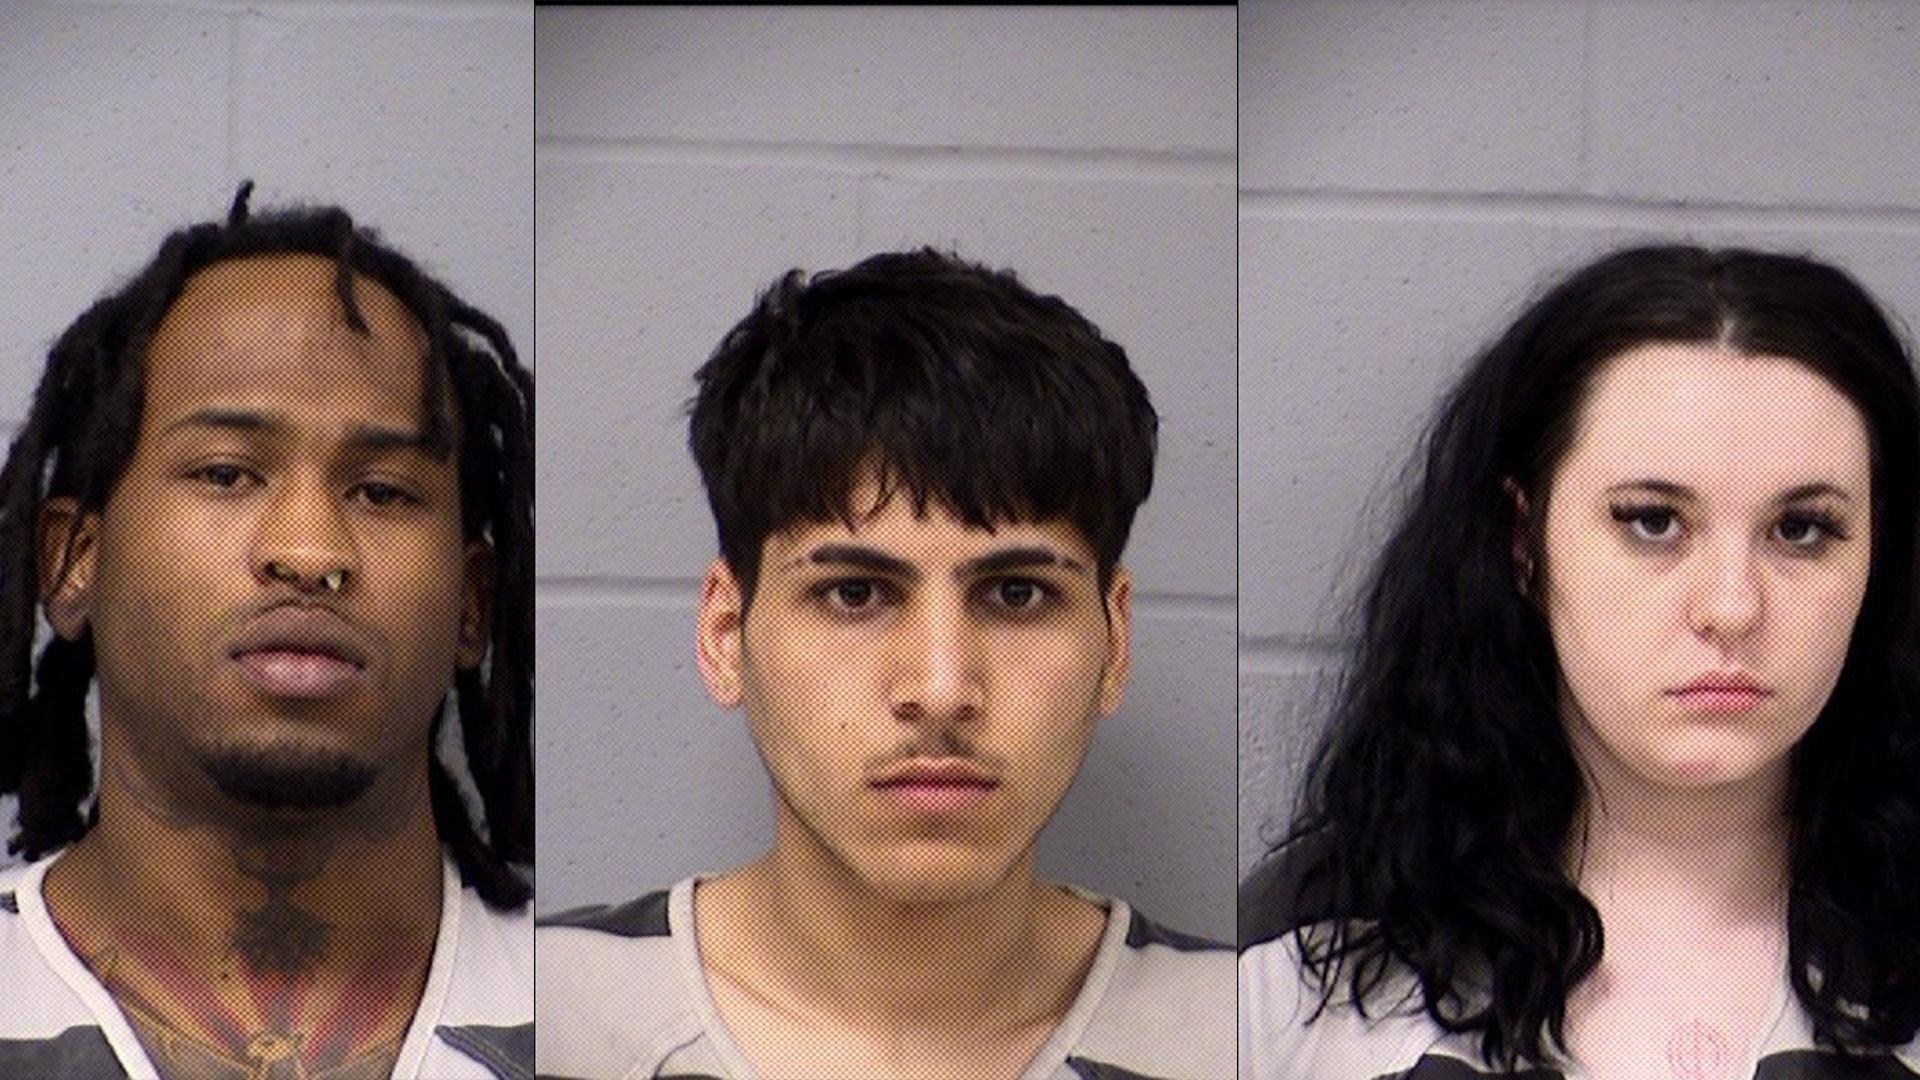 robbery suspects Austin 2-26-20